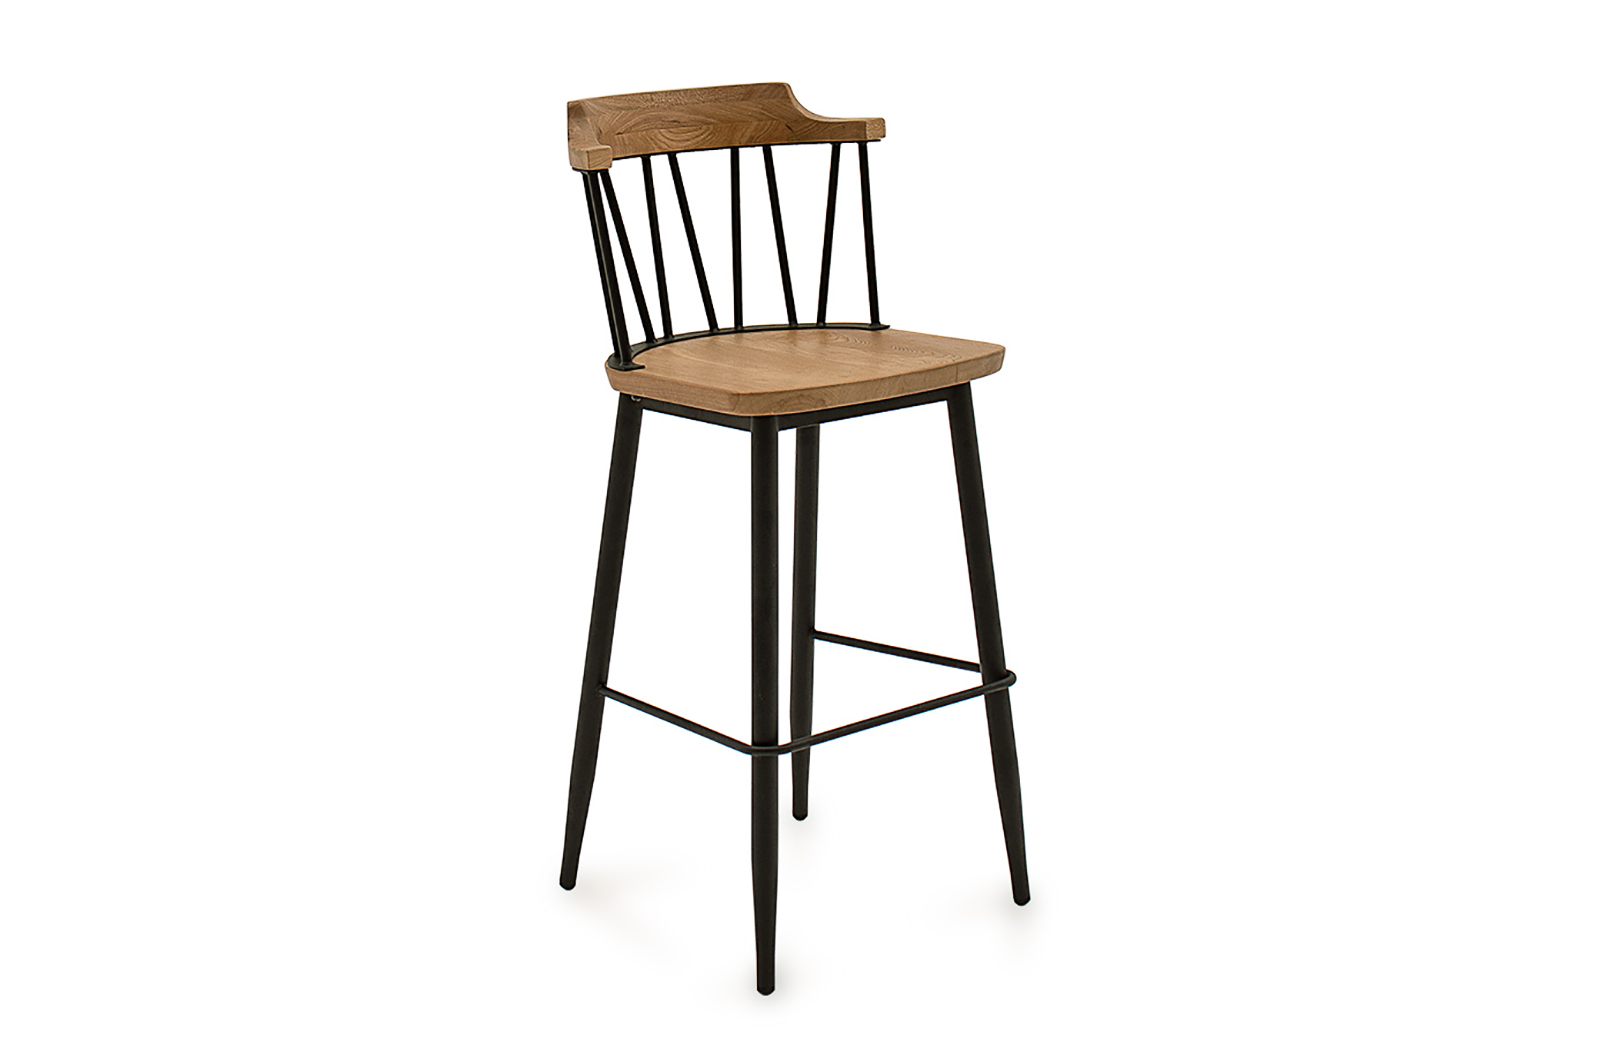 Blake Bar Chair Natural Angled